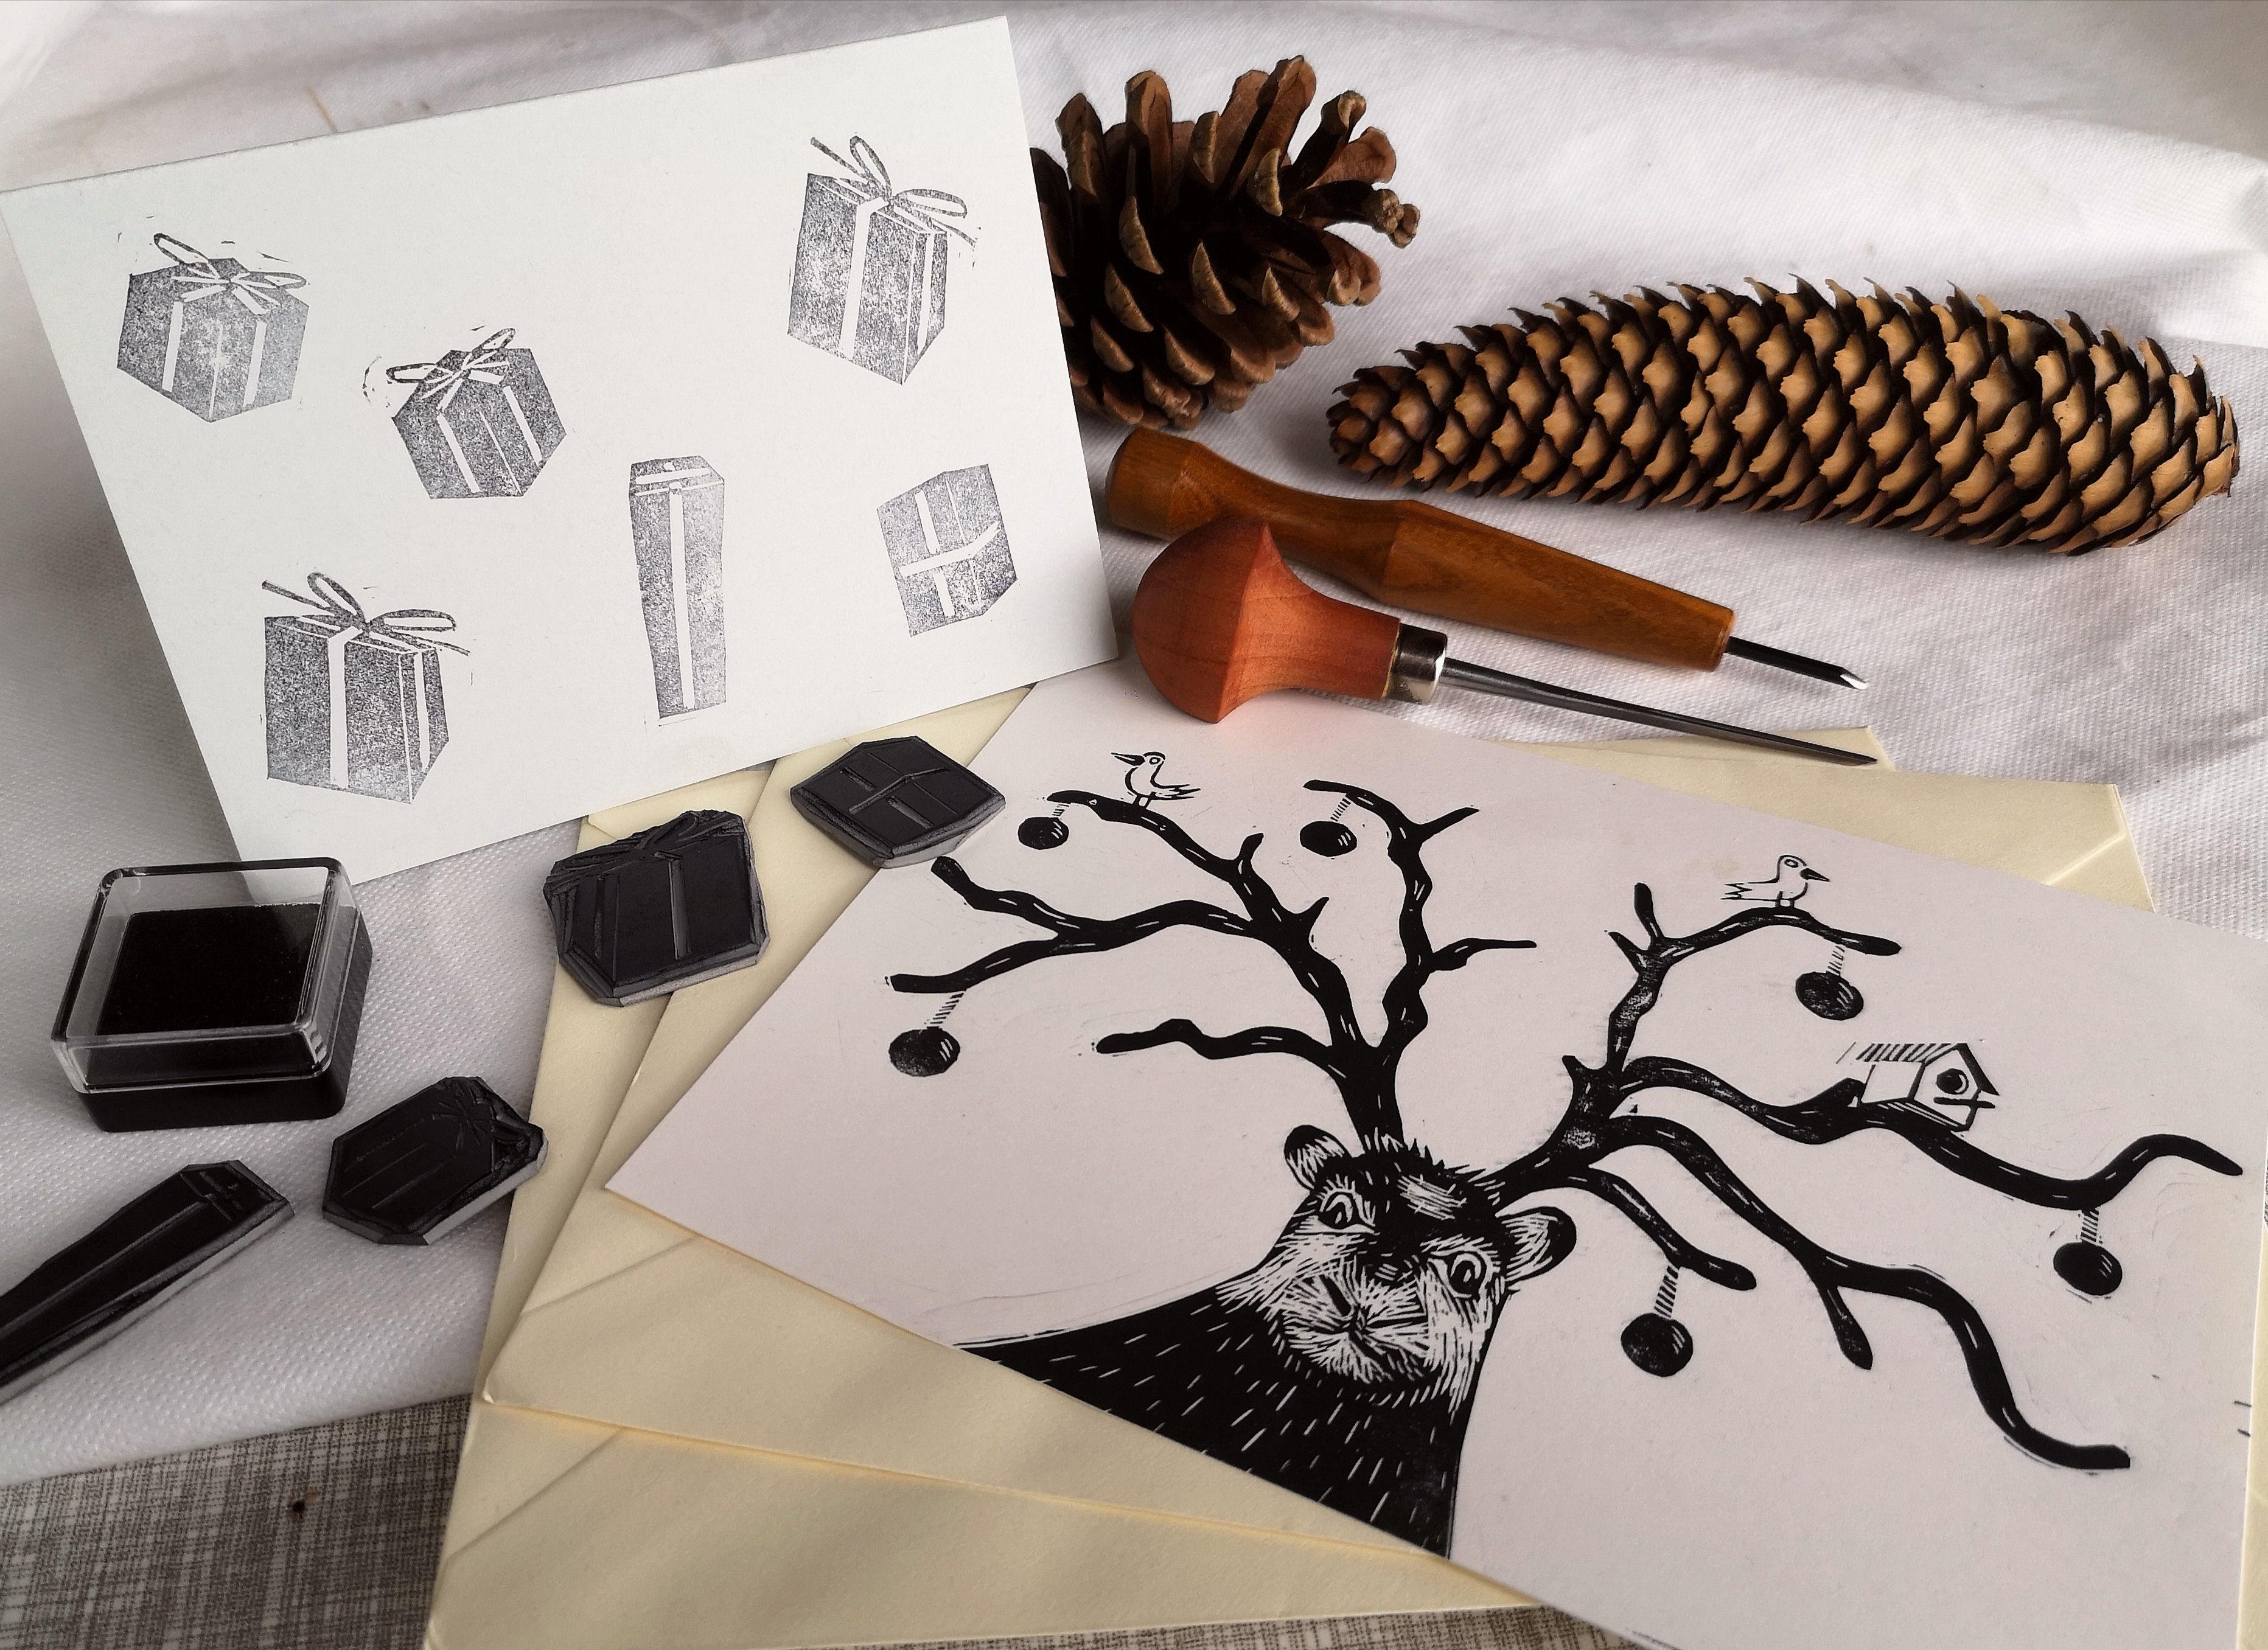 Printing Your Own Christmas Cards.Design And Print Your Own Christmas Cards And Gift Tags The Art Shack Shrewsbury